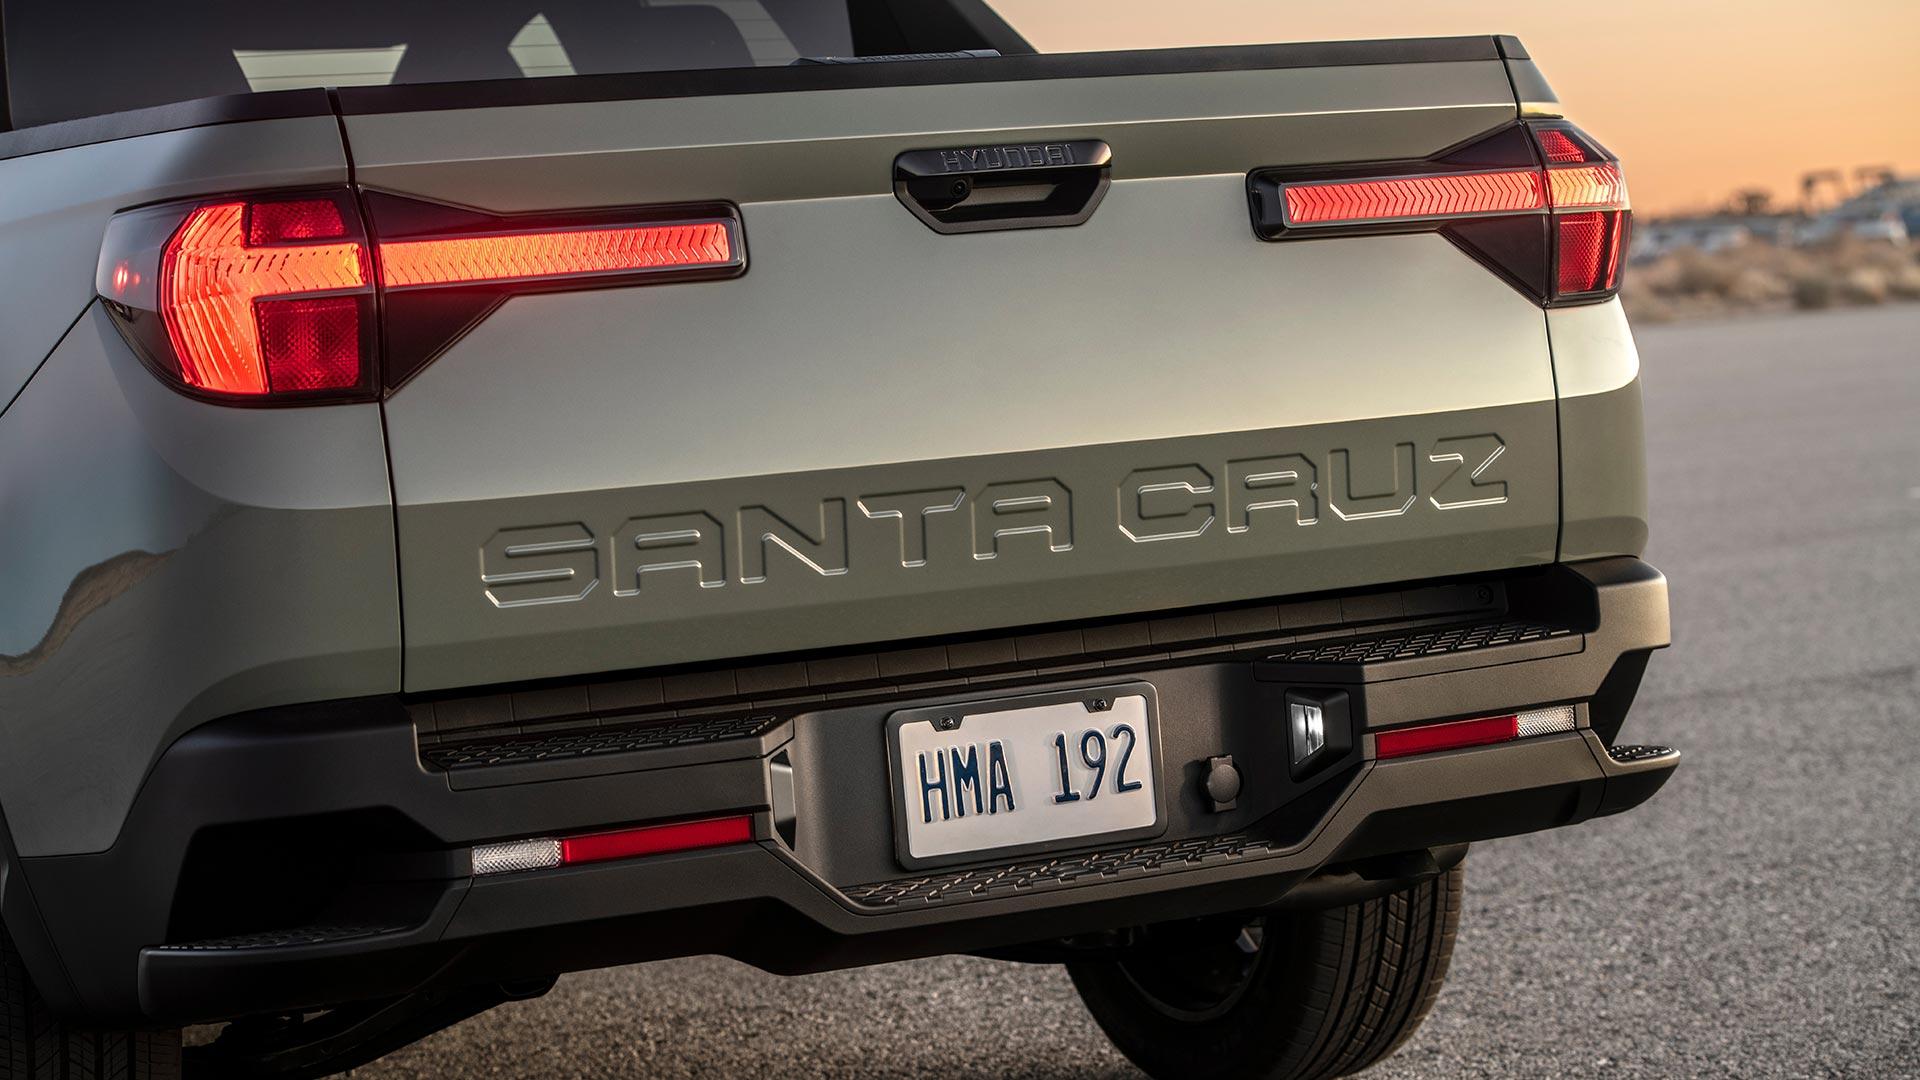 Hyundai Santa Cruz Cargo Bed Hatch